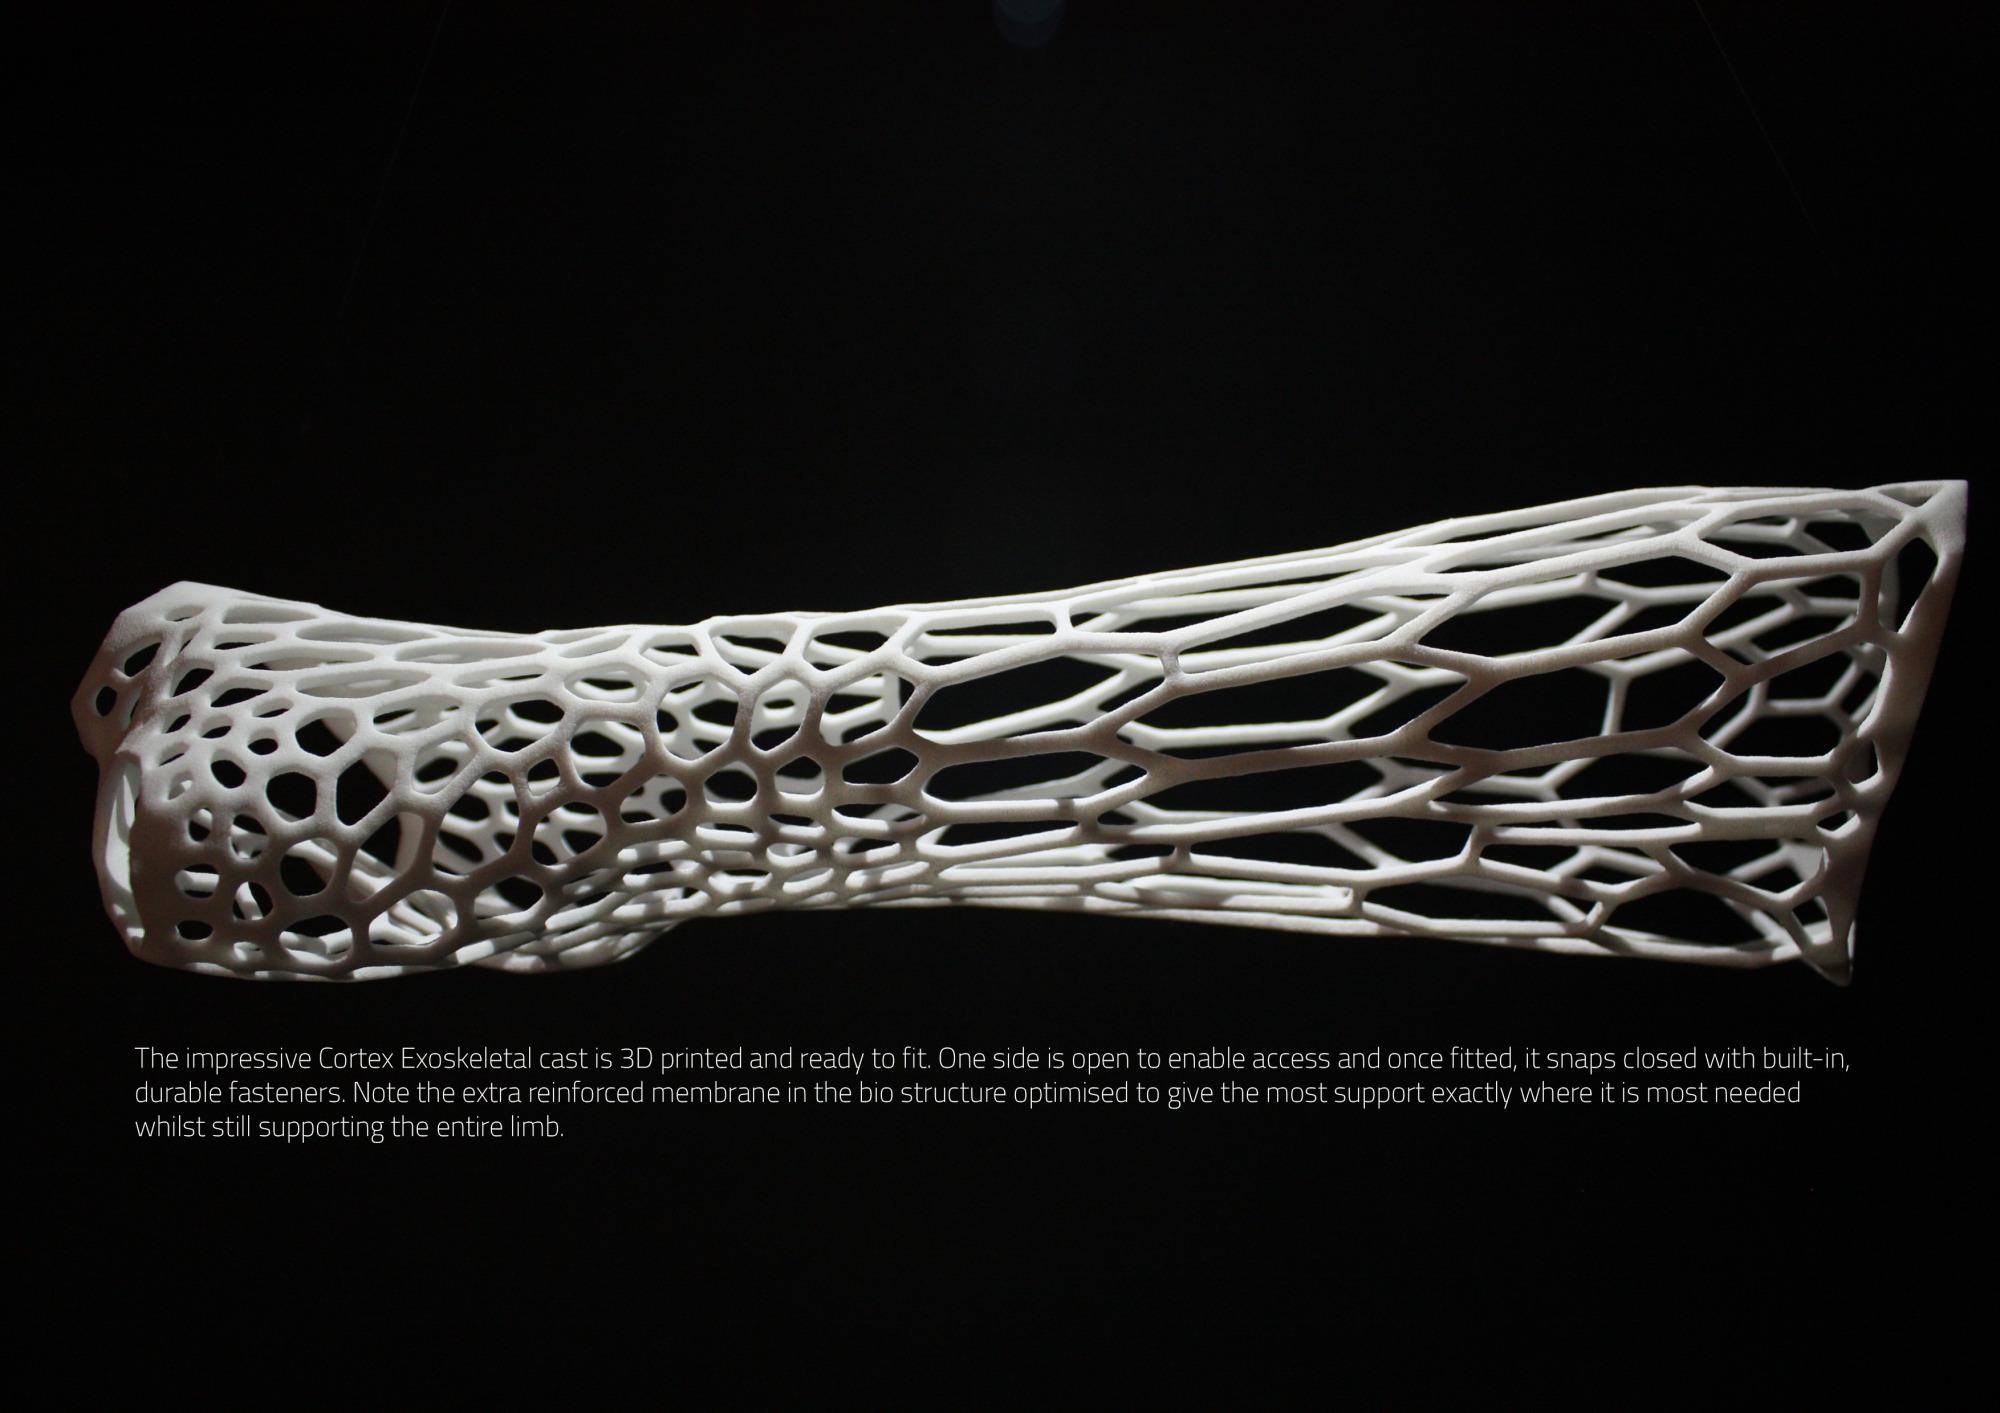 Cortex 3D Printed Cast structure